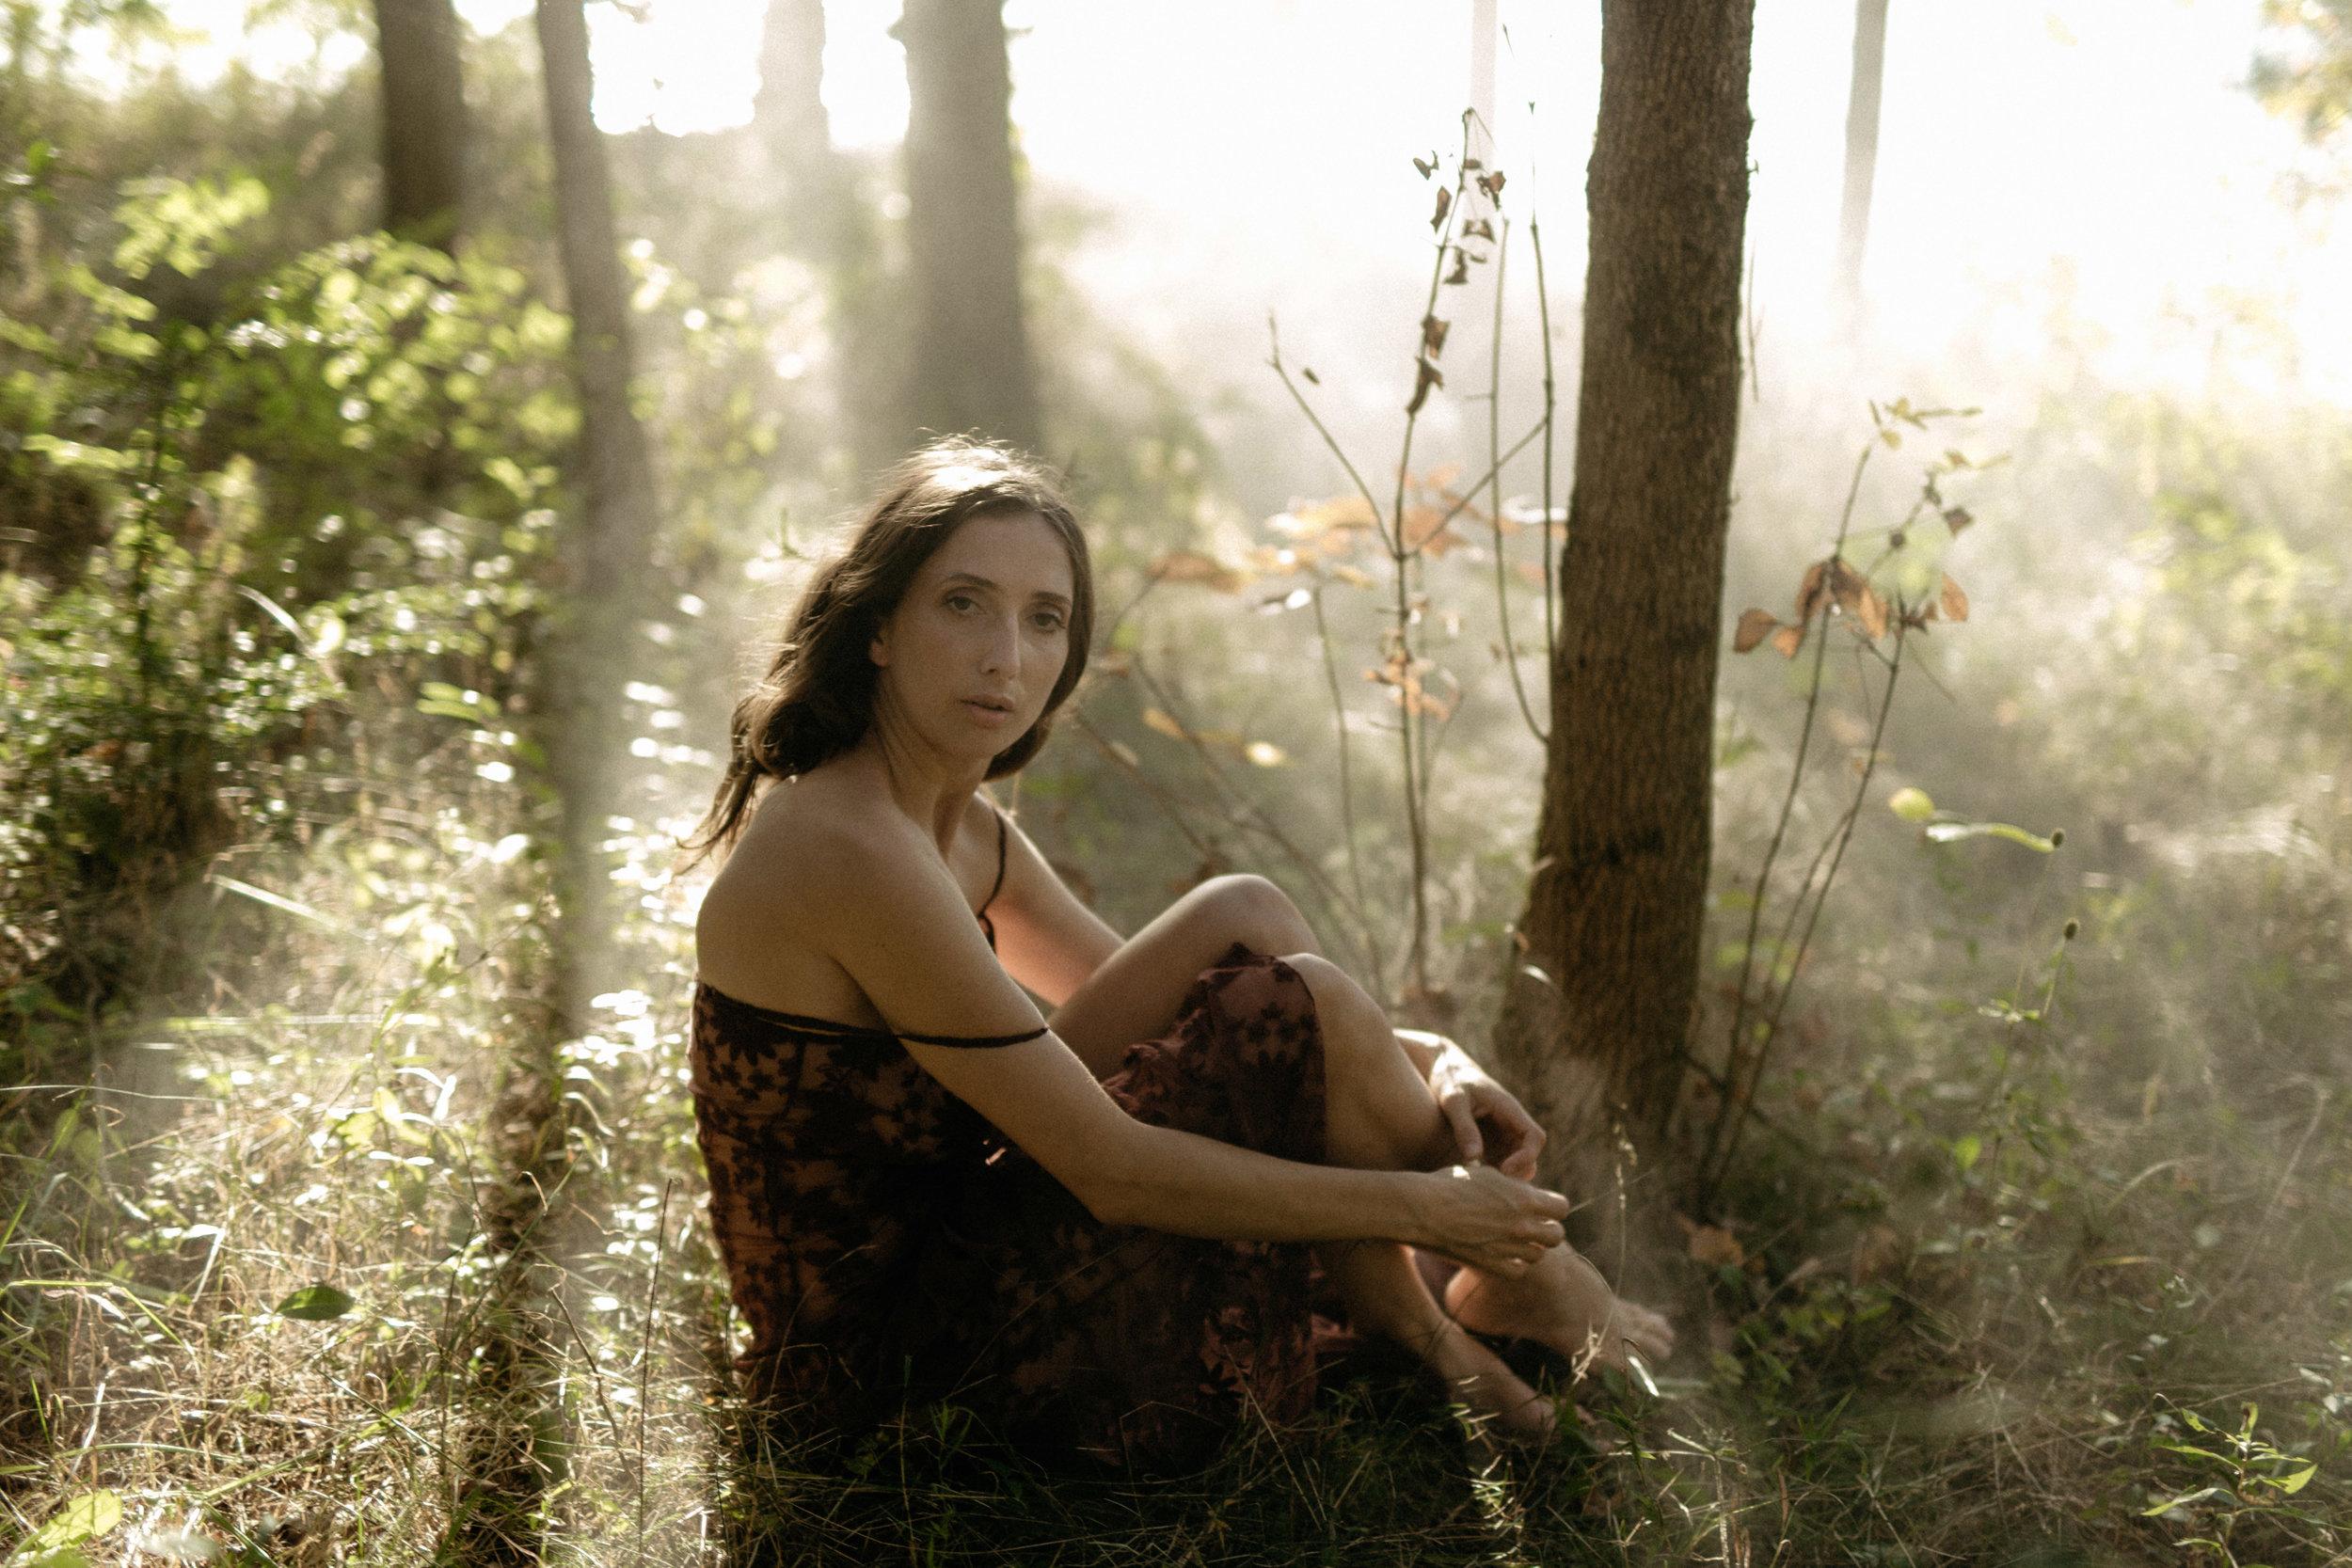 bohemian portrait session. boho style. floral dress. ohio art model. anoushanou. ohio portrait photographer. sarah rose photography. i am sarah rose.